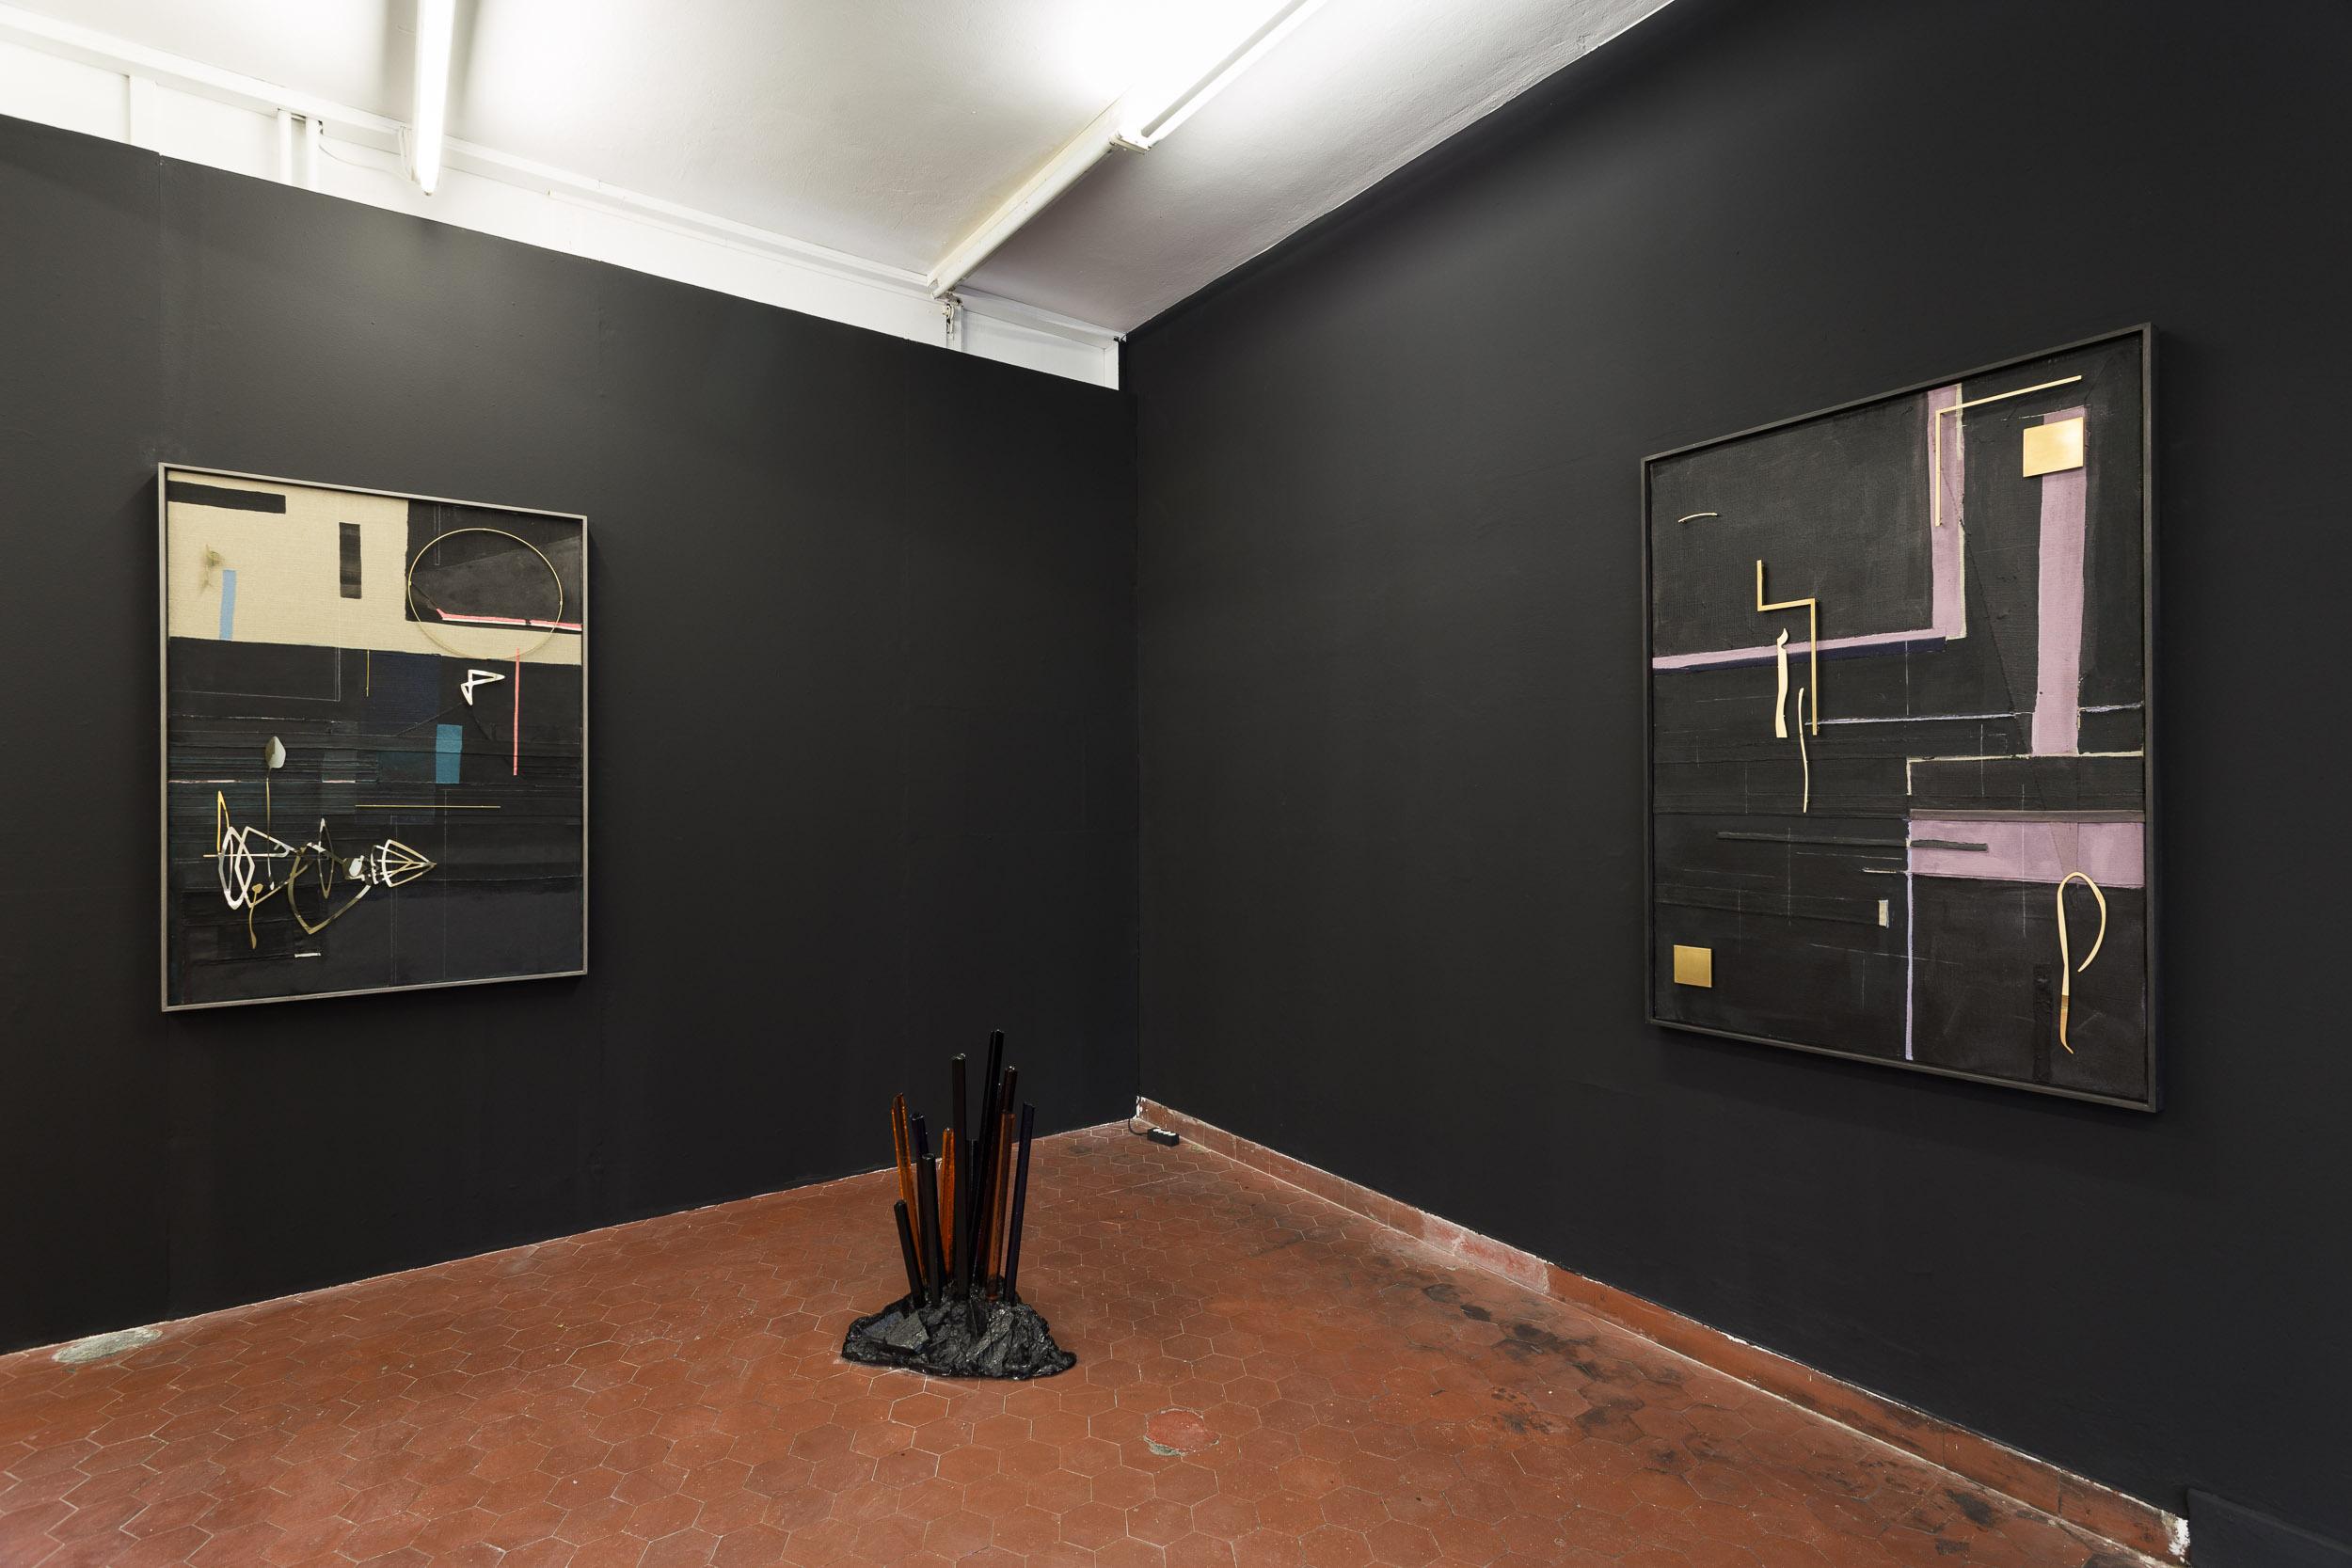 2. Kirstine Roepstorff & Matyás Chochola | Side Step: Nadim Abbas, installation view, Last Tango Photo: Kilian Bannwart